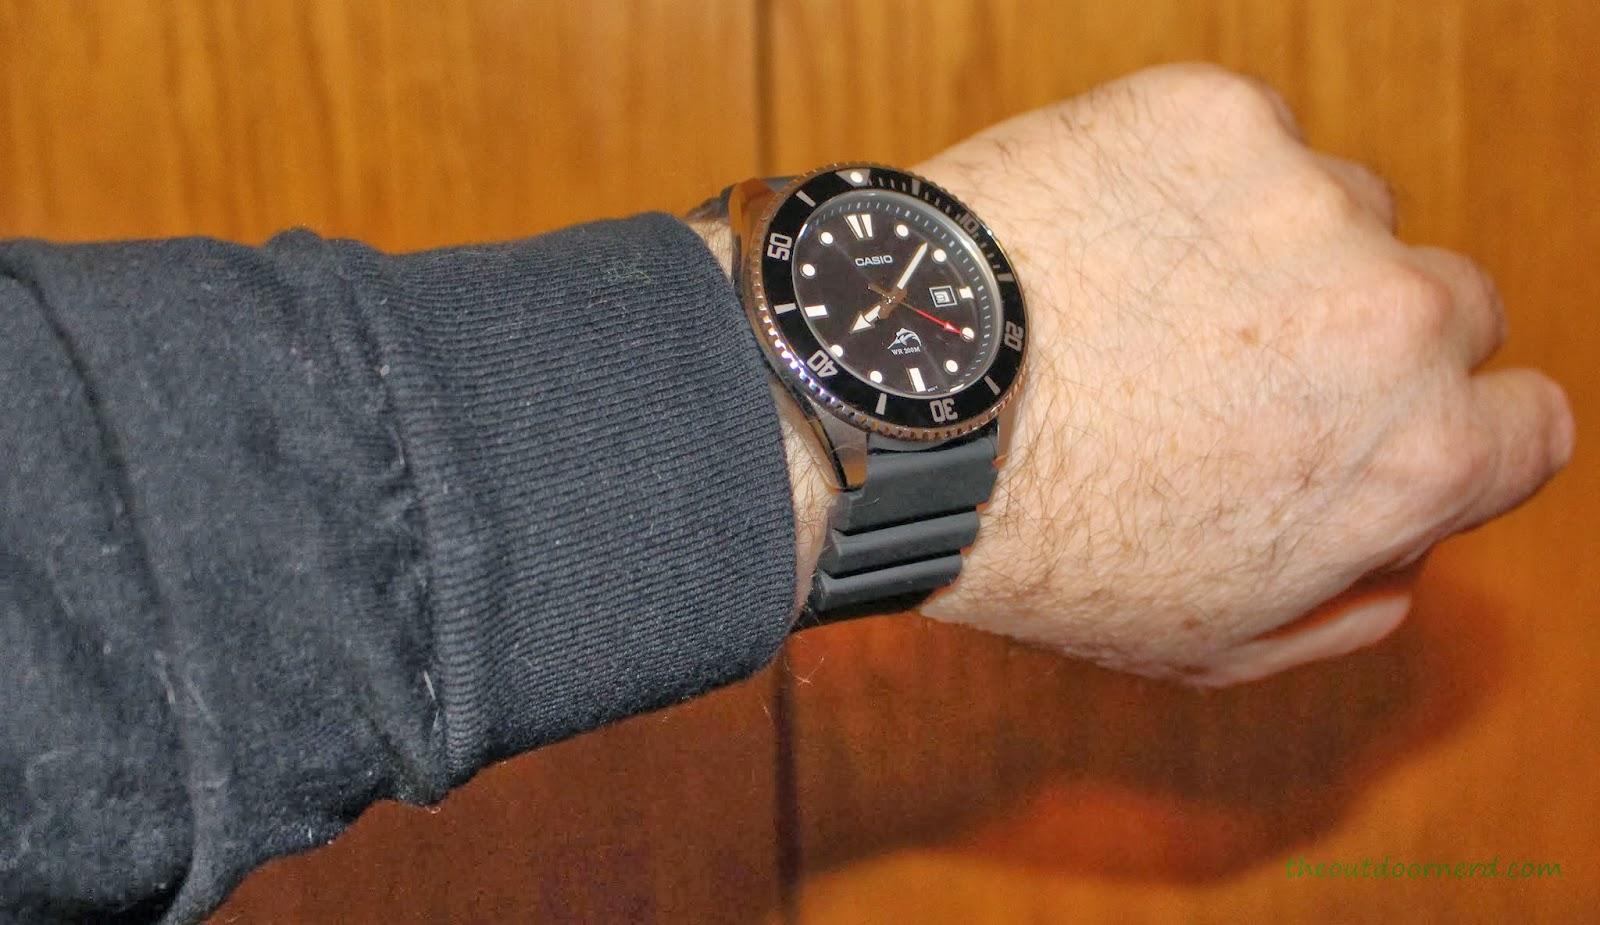 Casio MDV106-1A Diver's Watch: On Wrist